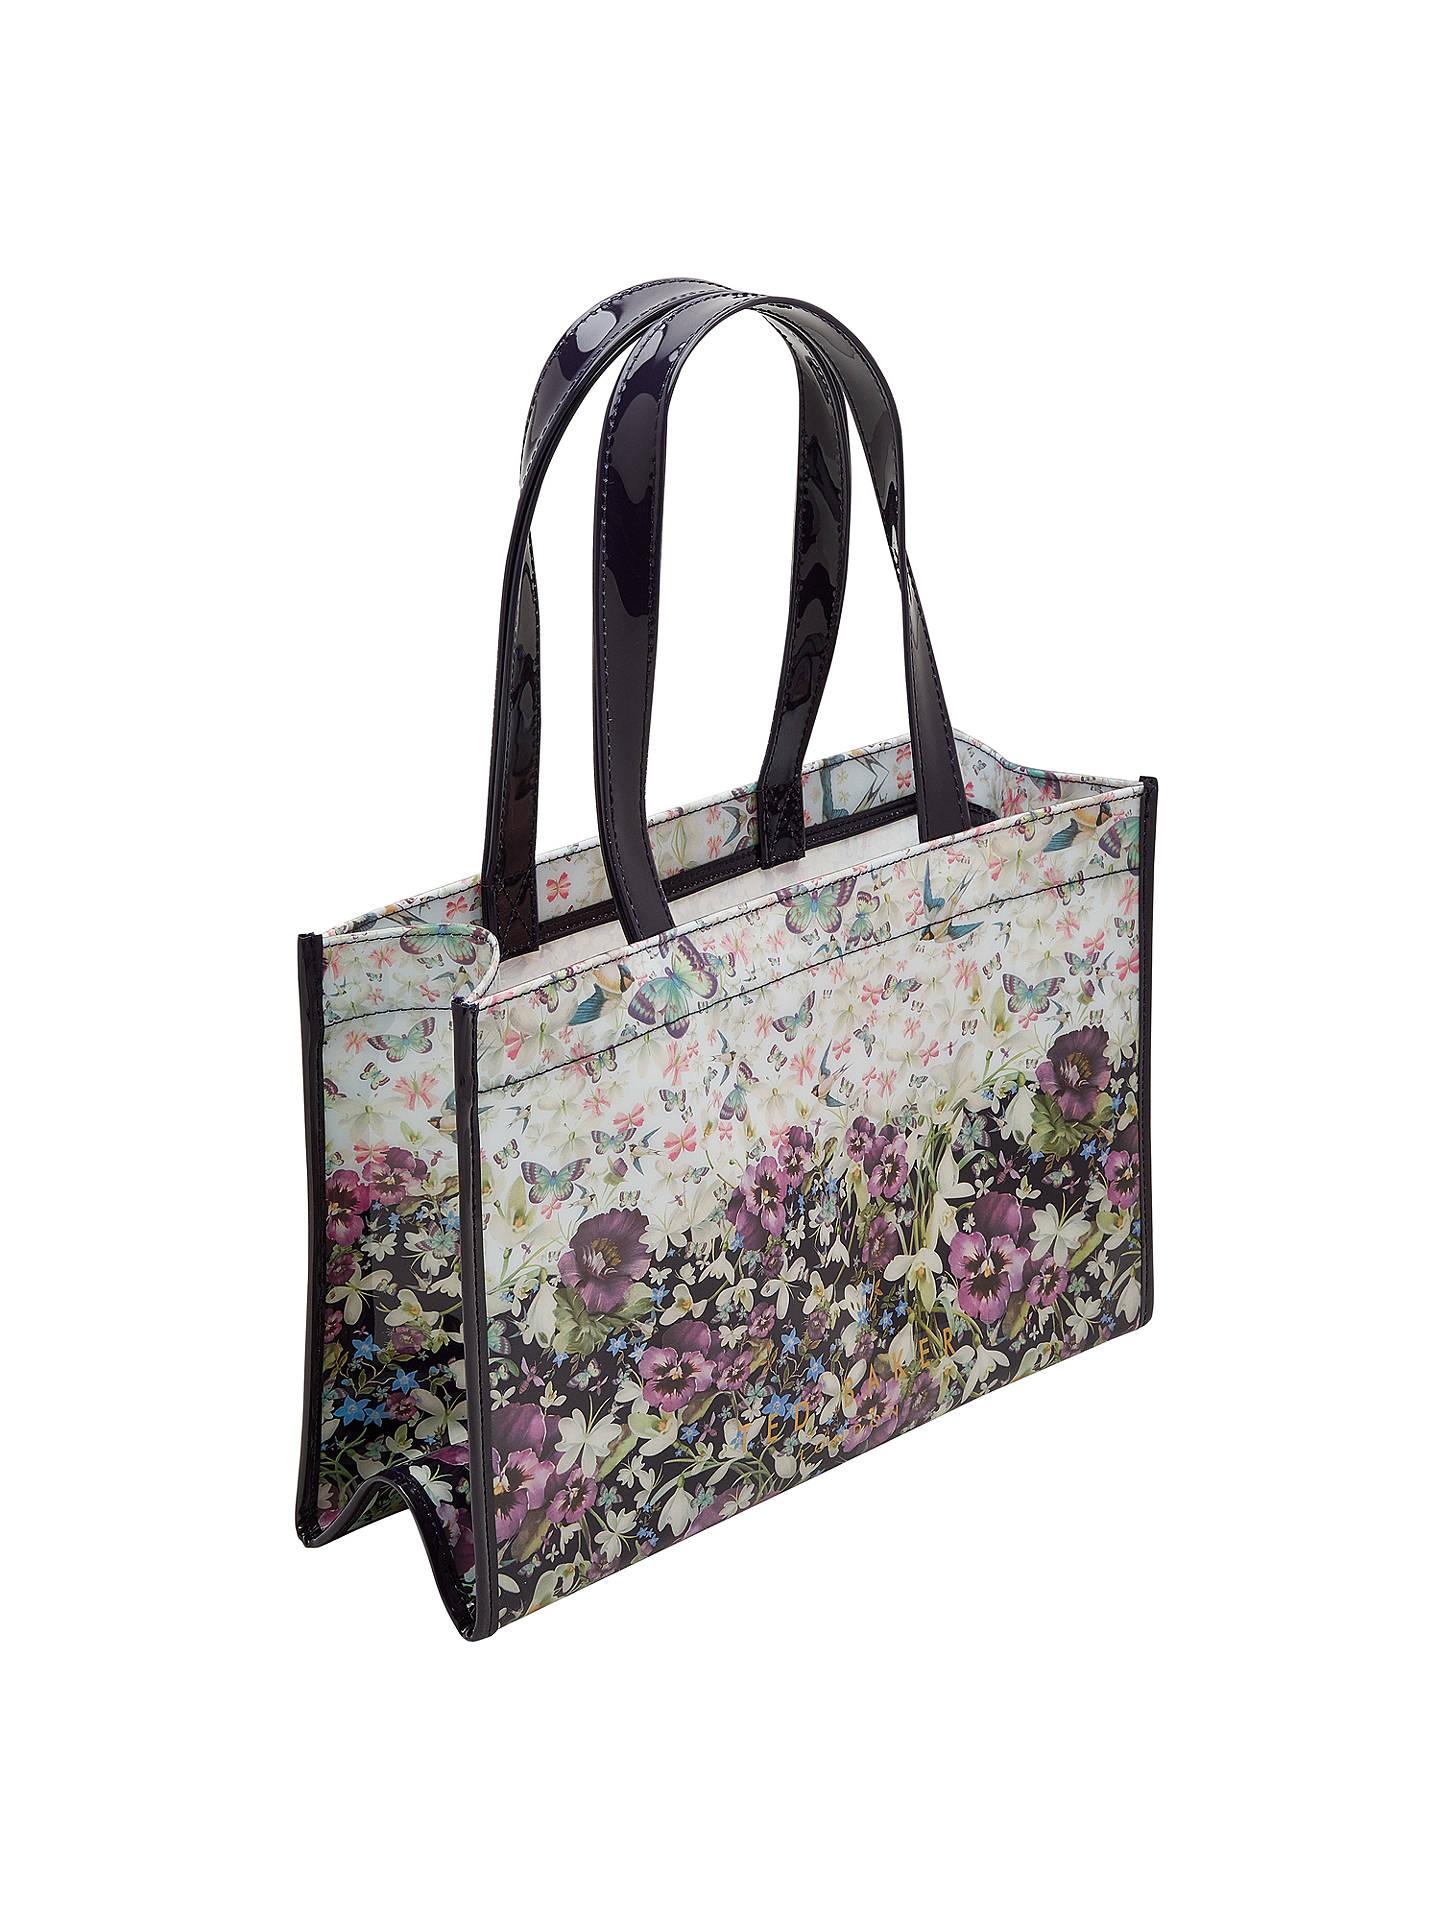 9463aa242cc55 ... Buy Ted Baker Gelly Entangled Enchantment Shopper Bag and Flip Flop  Set